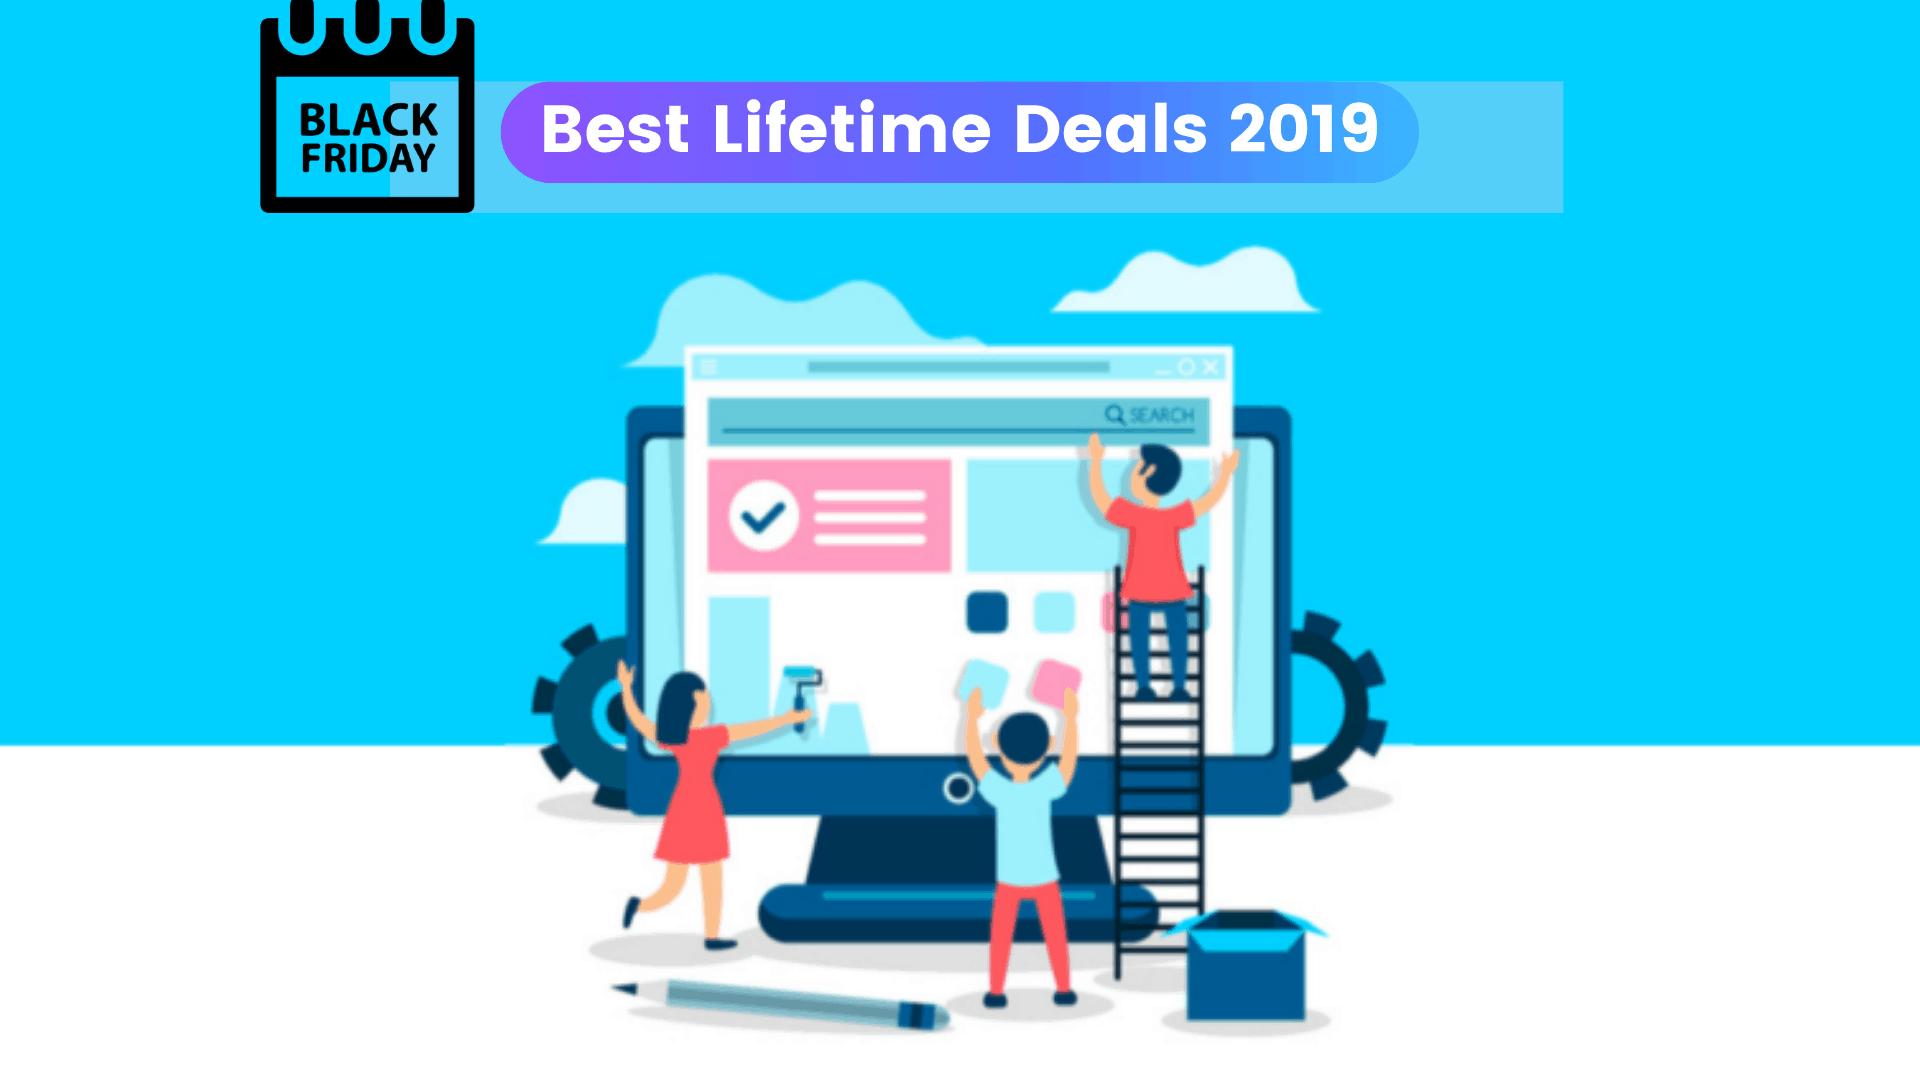 best lifetime deals 2019